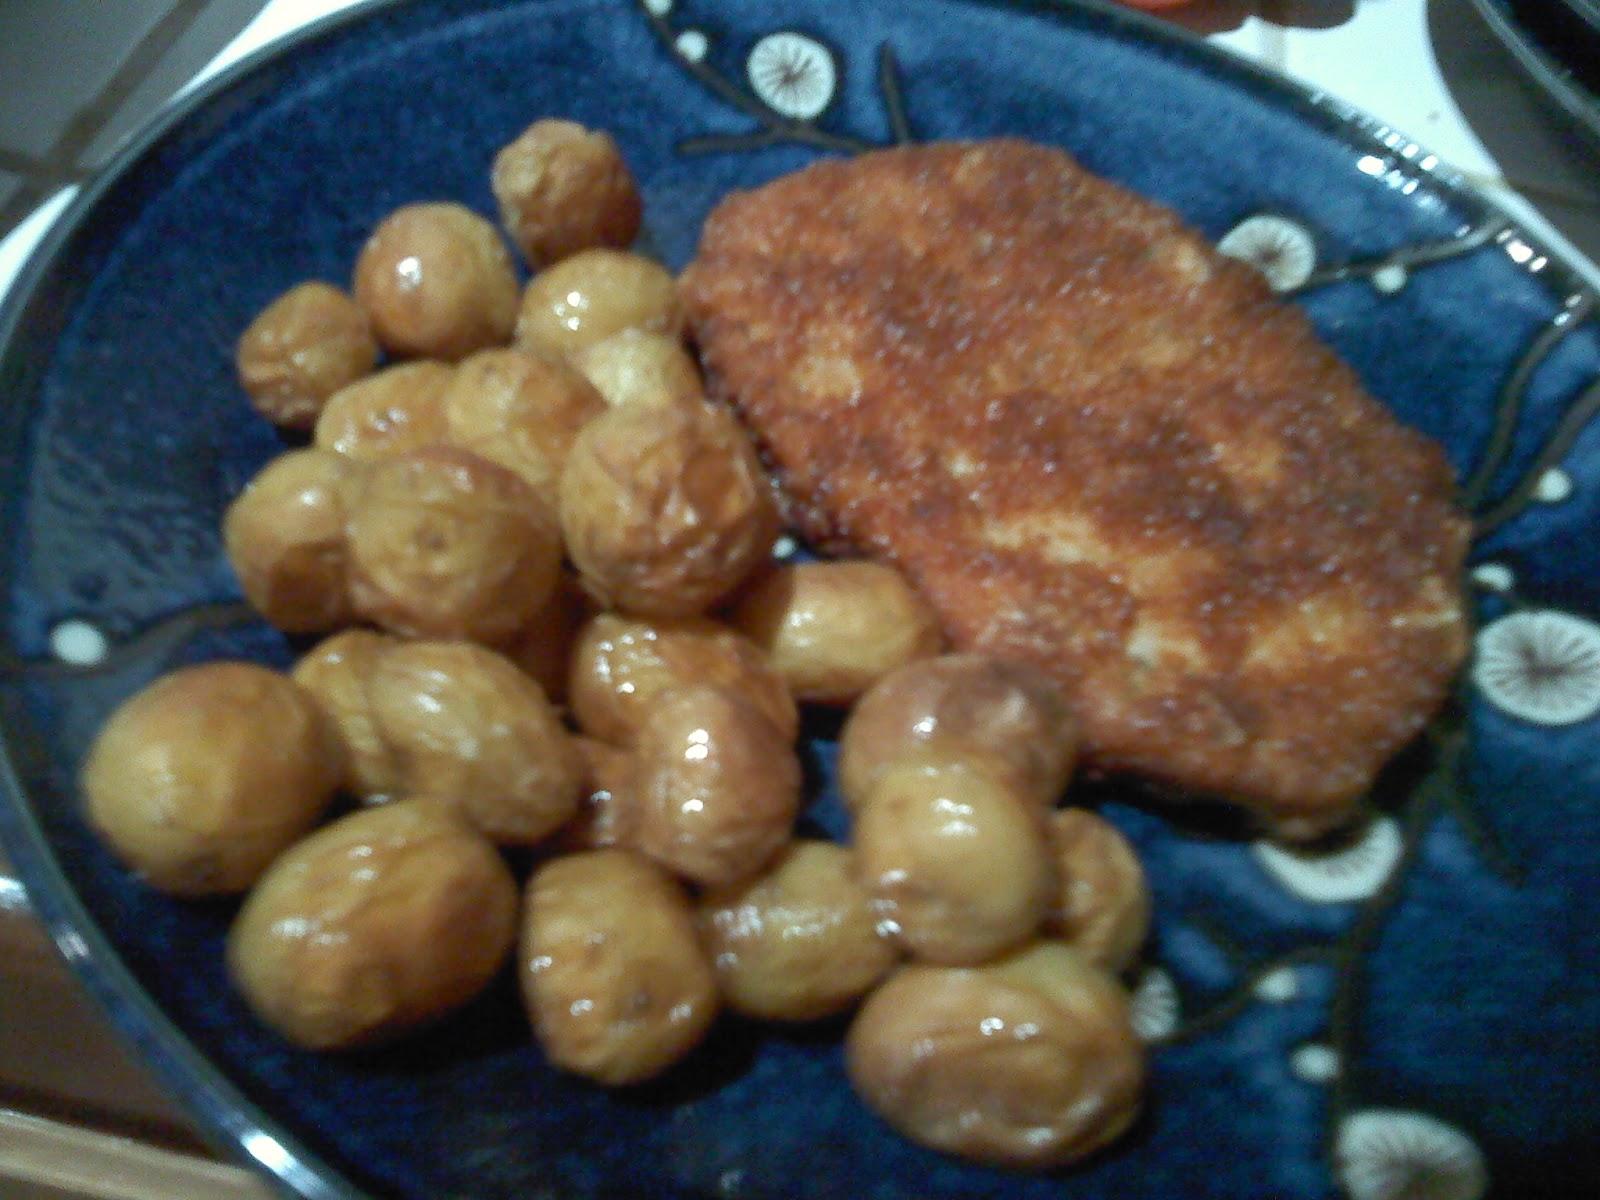 Sophia Martin 39 S Recipe Blog Fried Pork Chops With Baby